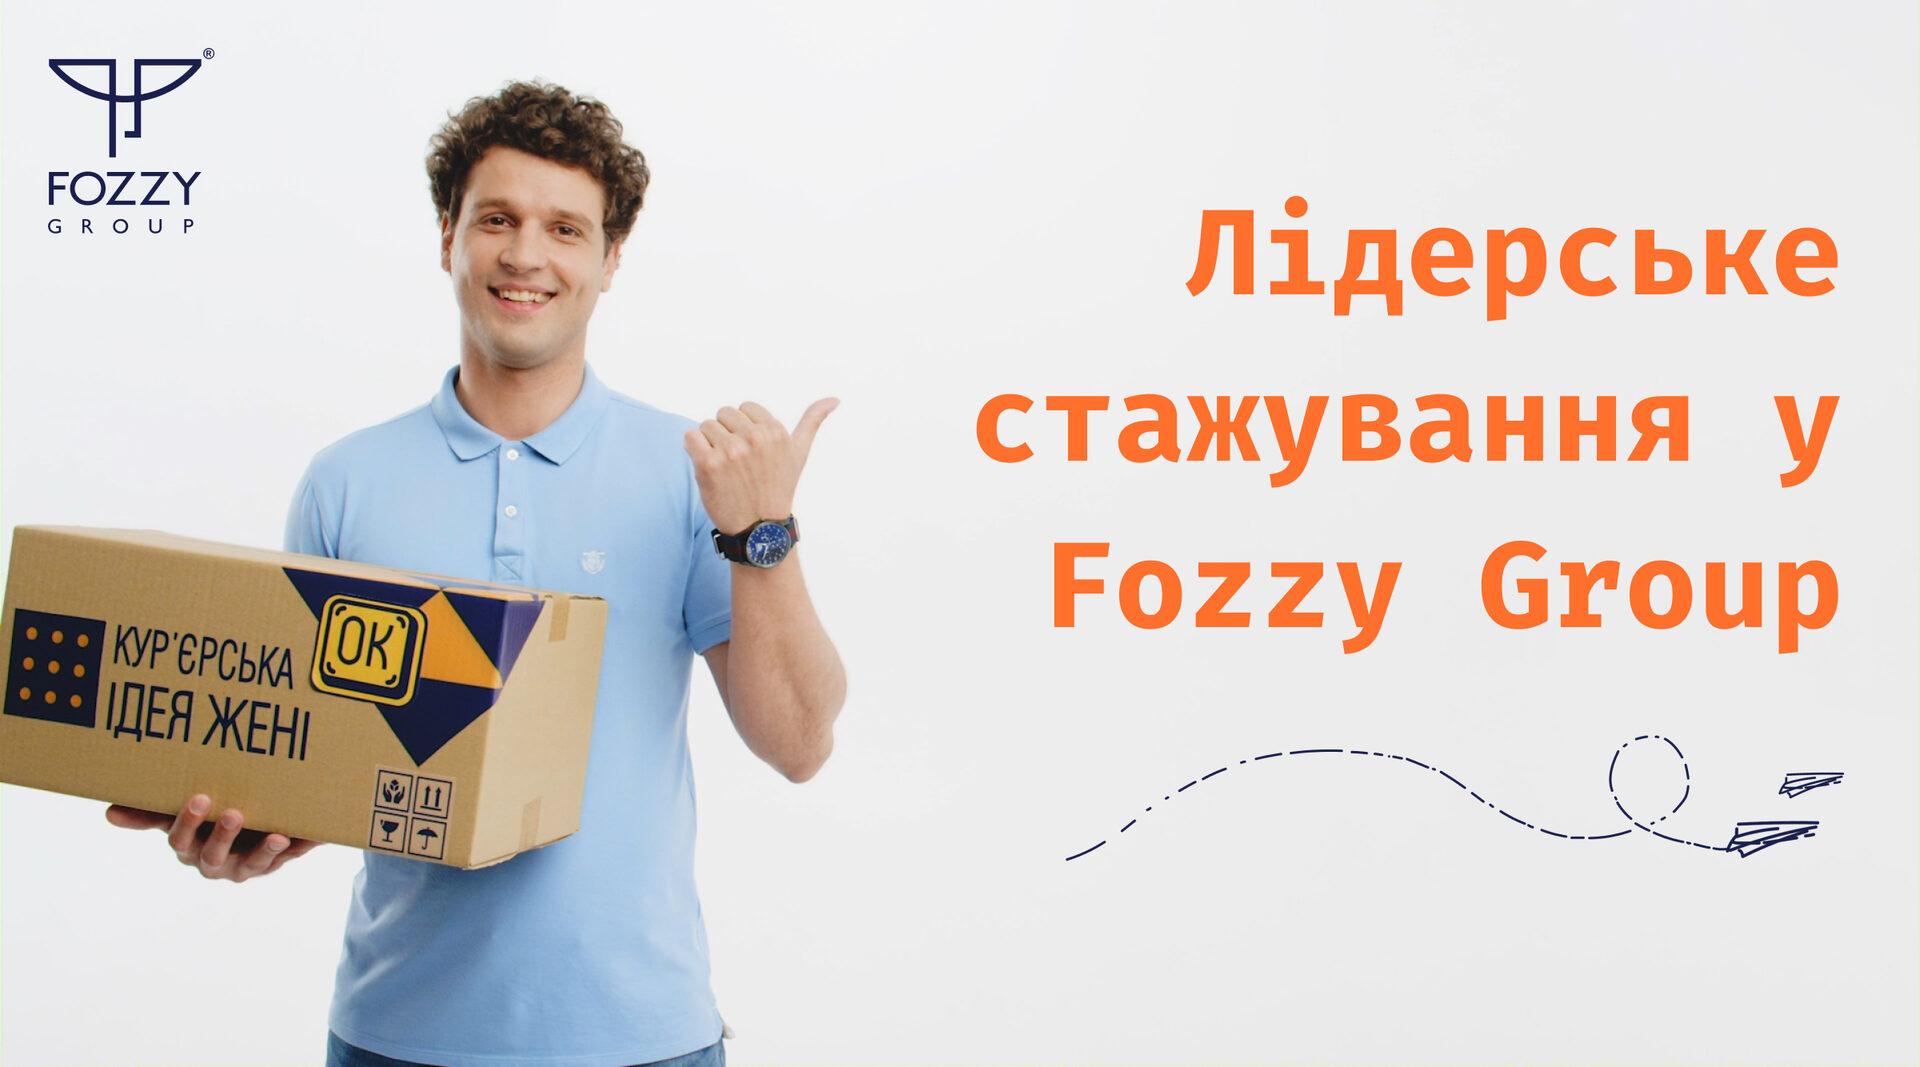 Перше лідерське стажування у Fozzy Group - studentu, press-release, news, career, business